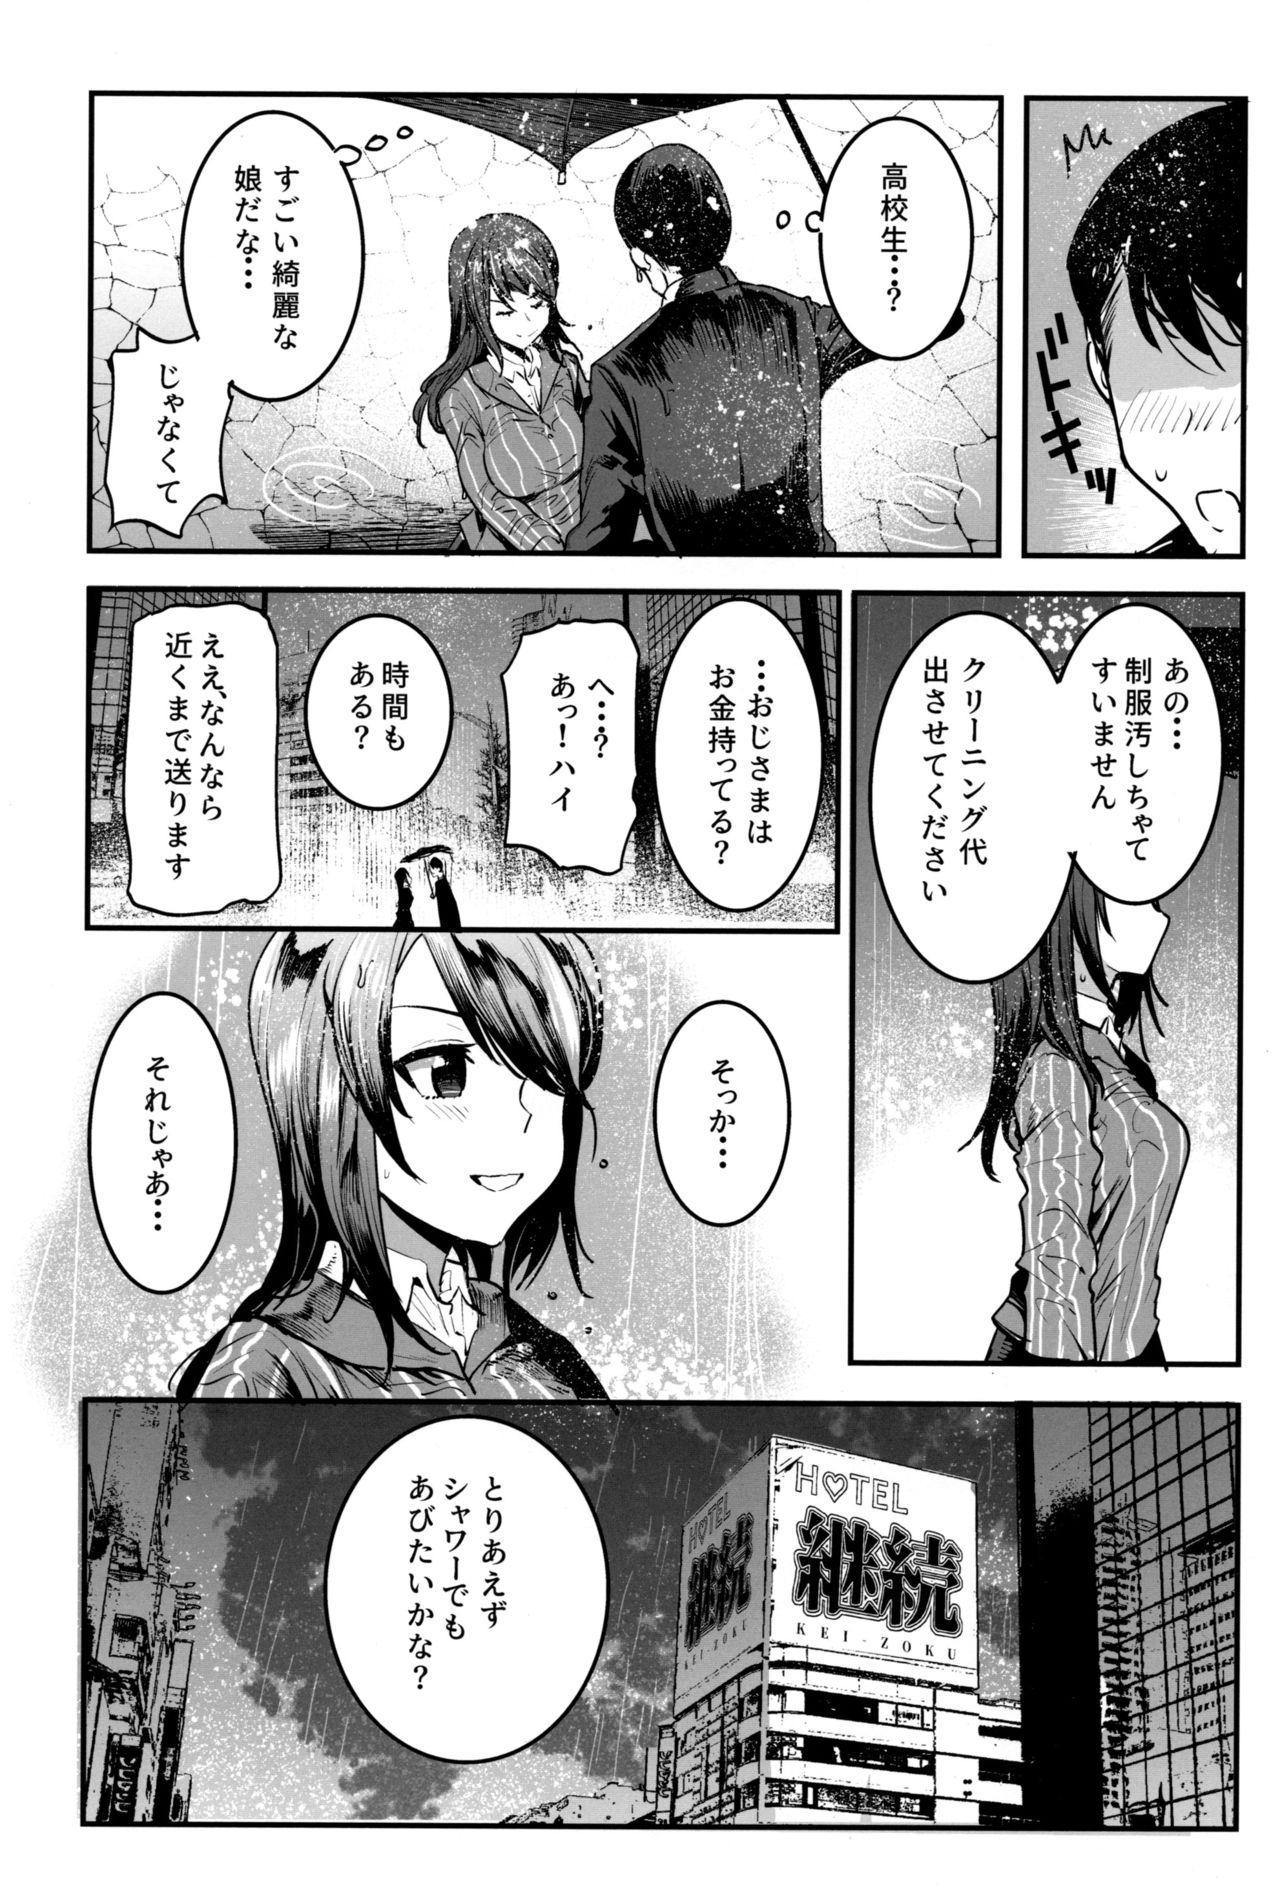 GirlPan Rakugakichou 10 3